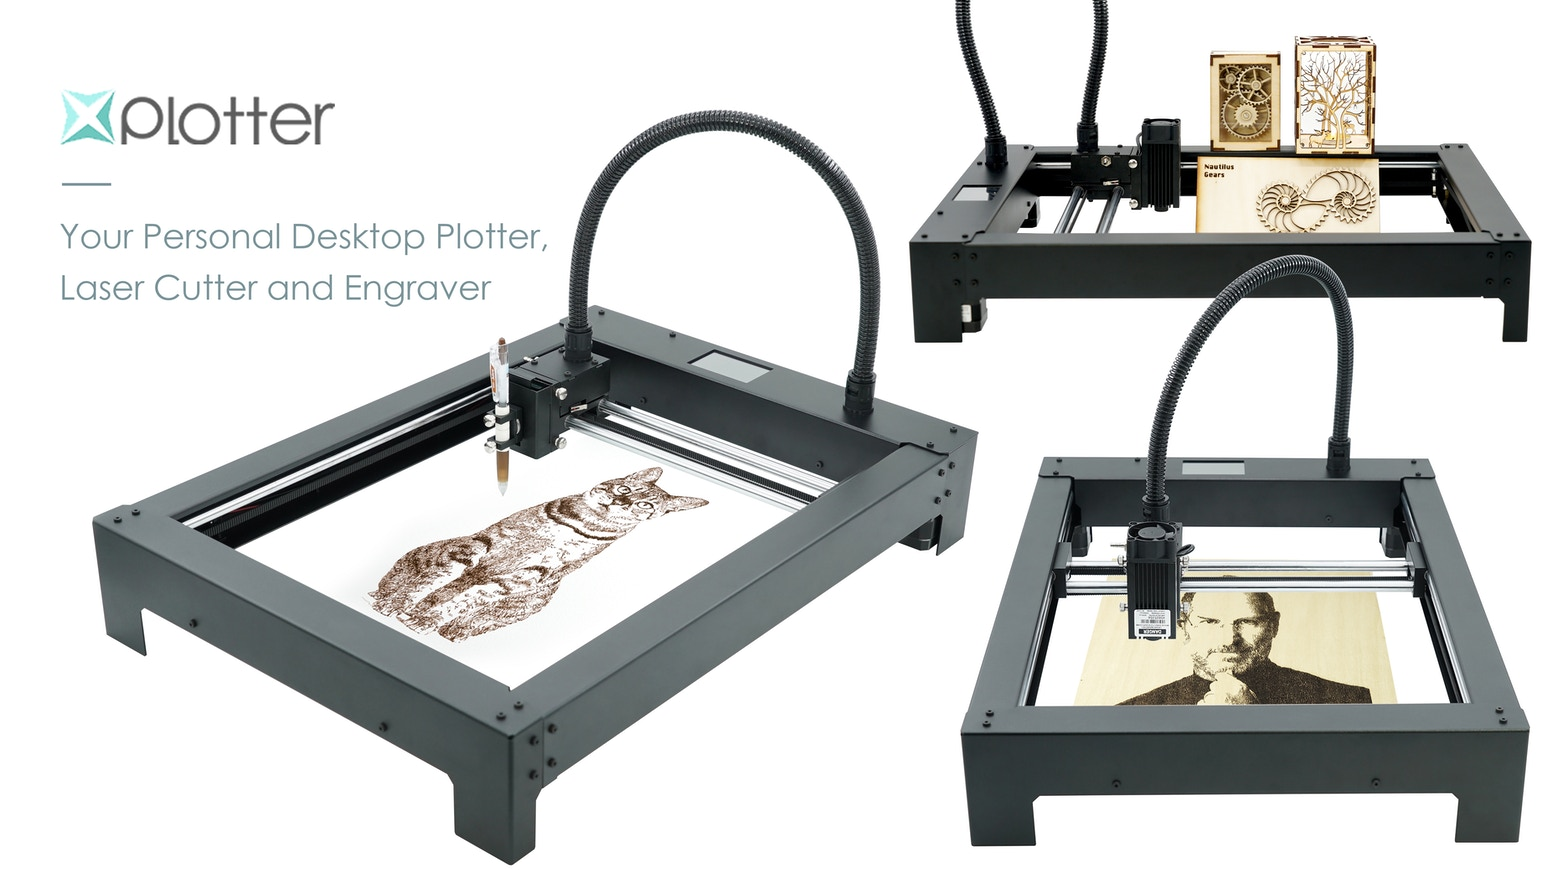 XPlotter - Desktop Plotter, Laser Cutter and Engraver by ...